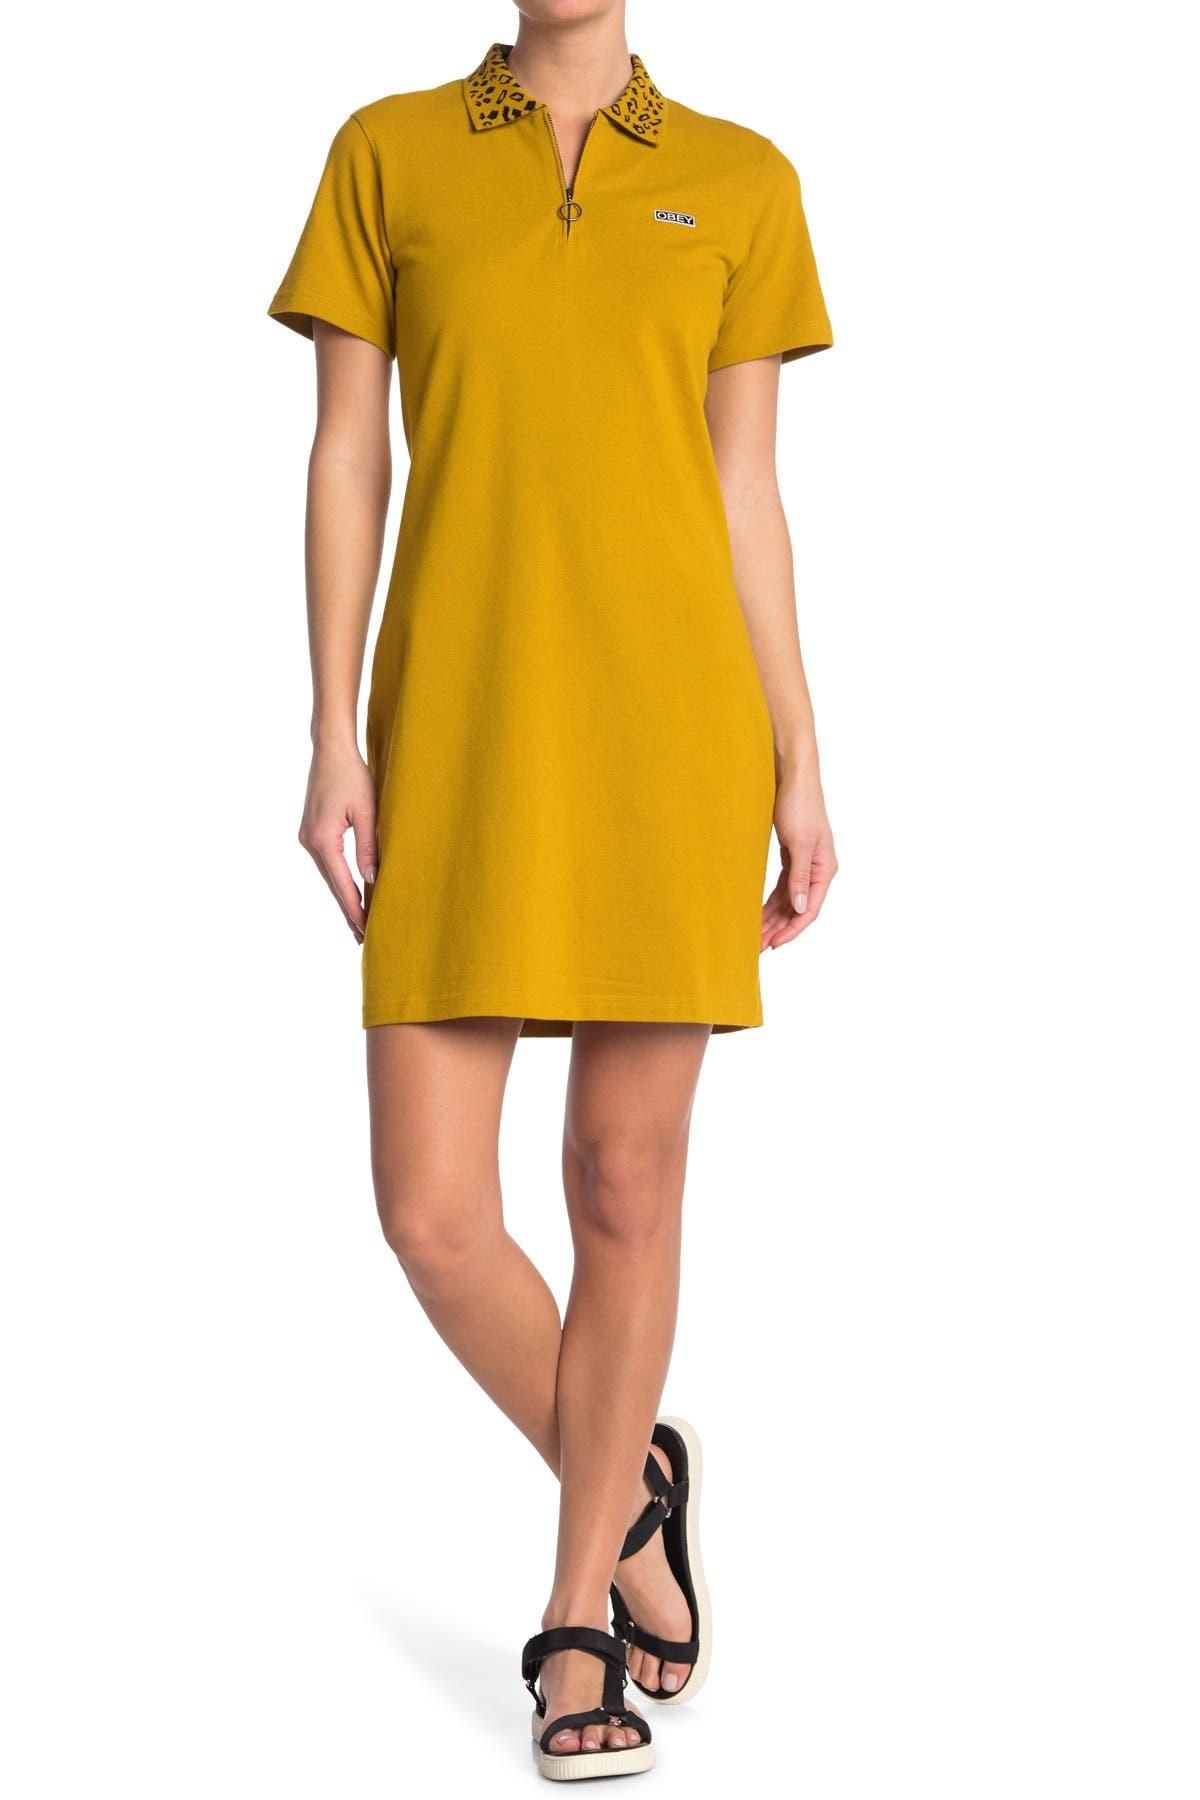 Image of Obey Liana Dress